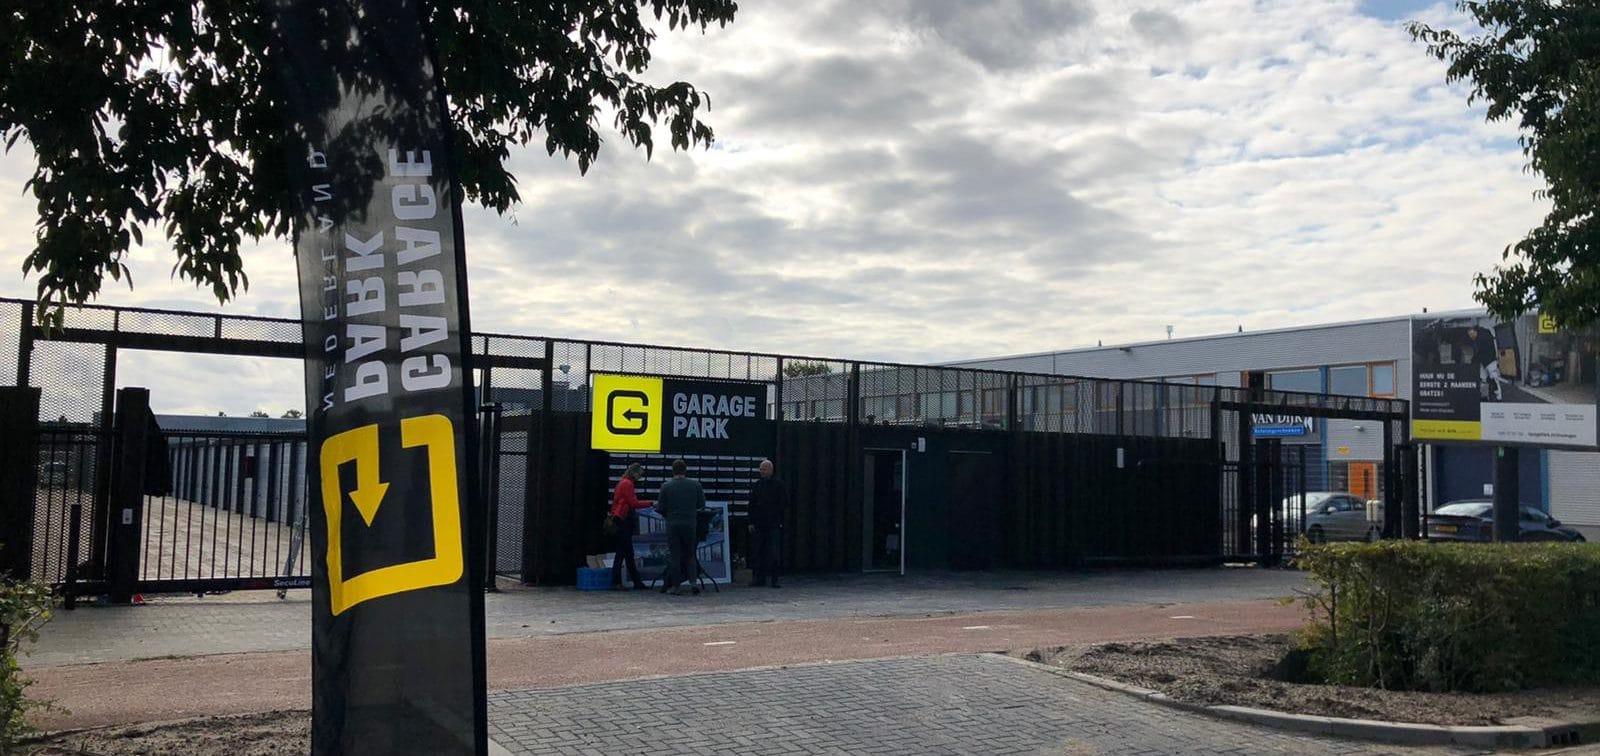 GaragePark Groningen